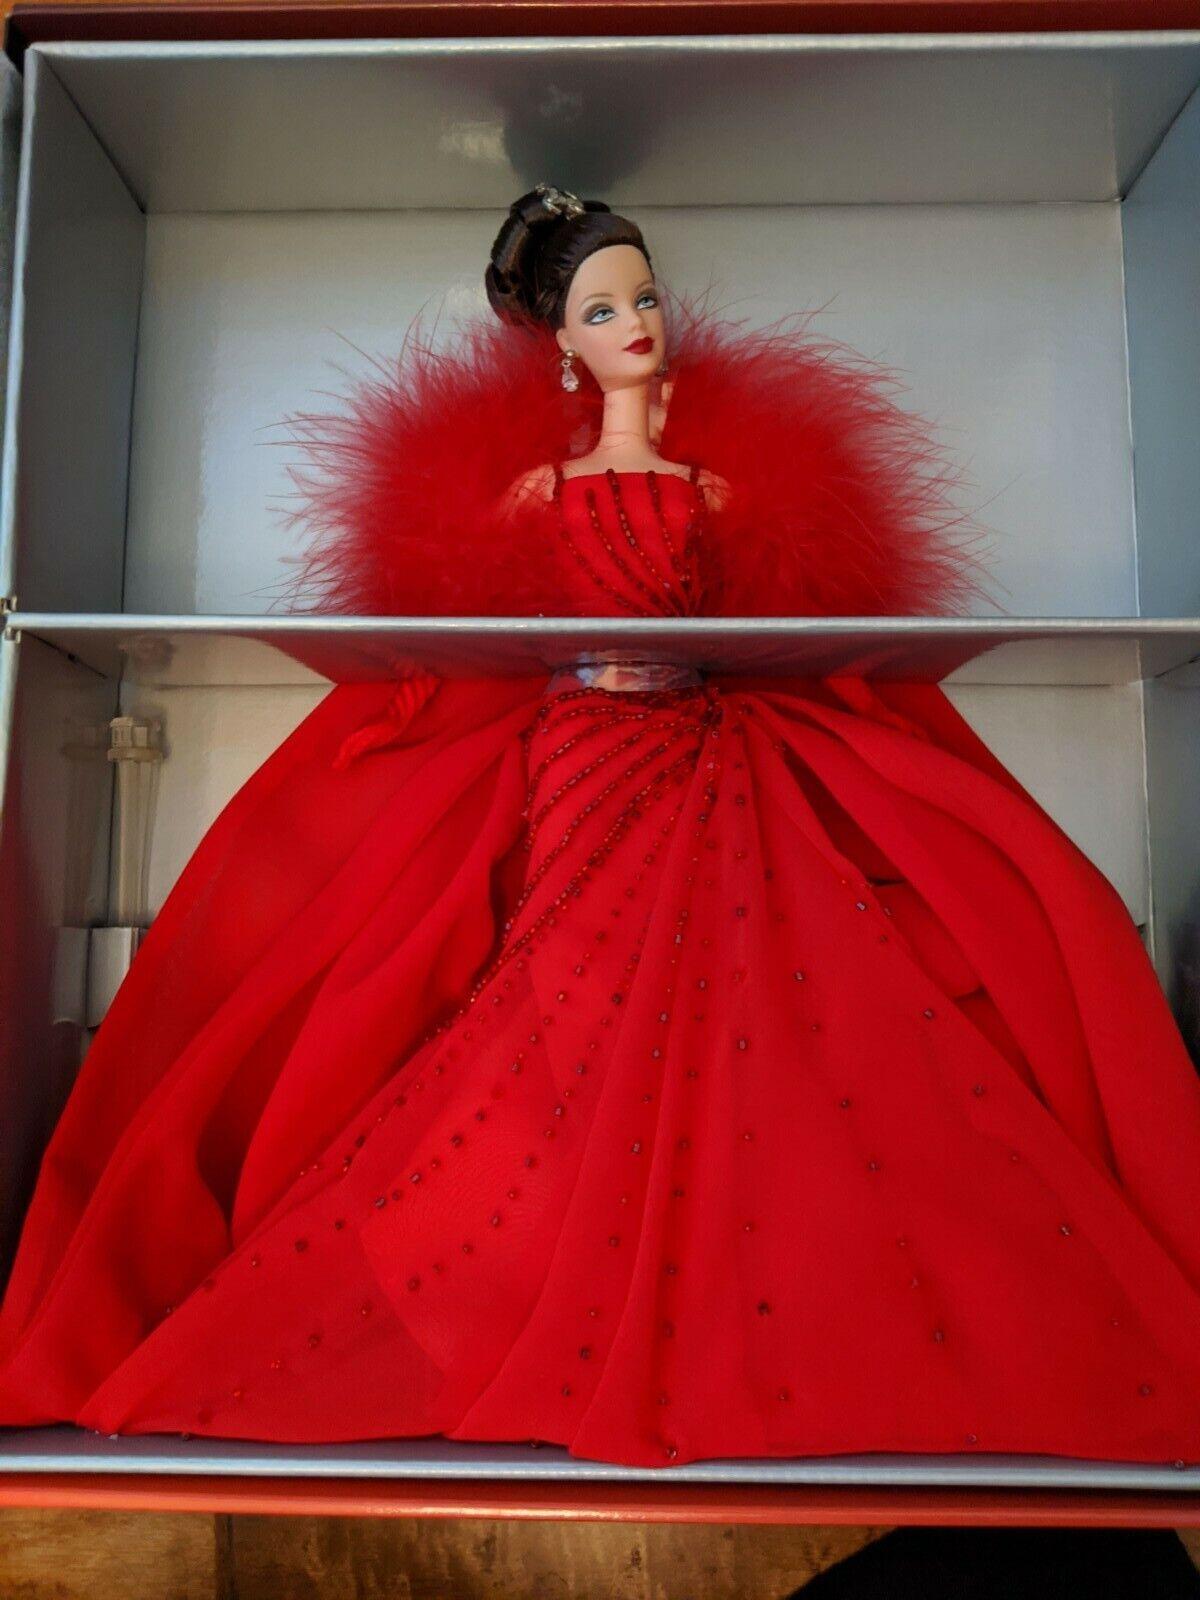 2000 Ferrari Barbie Doll in original packaging 29608